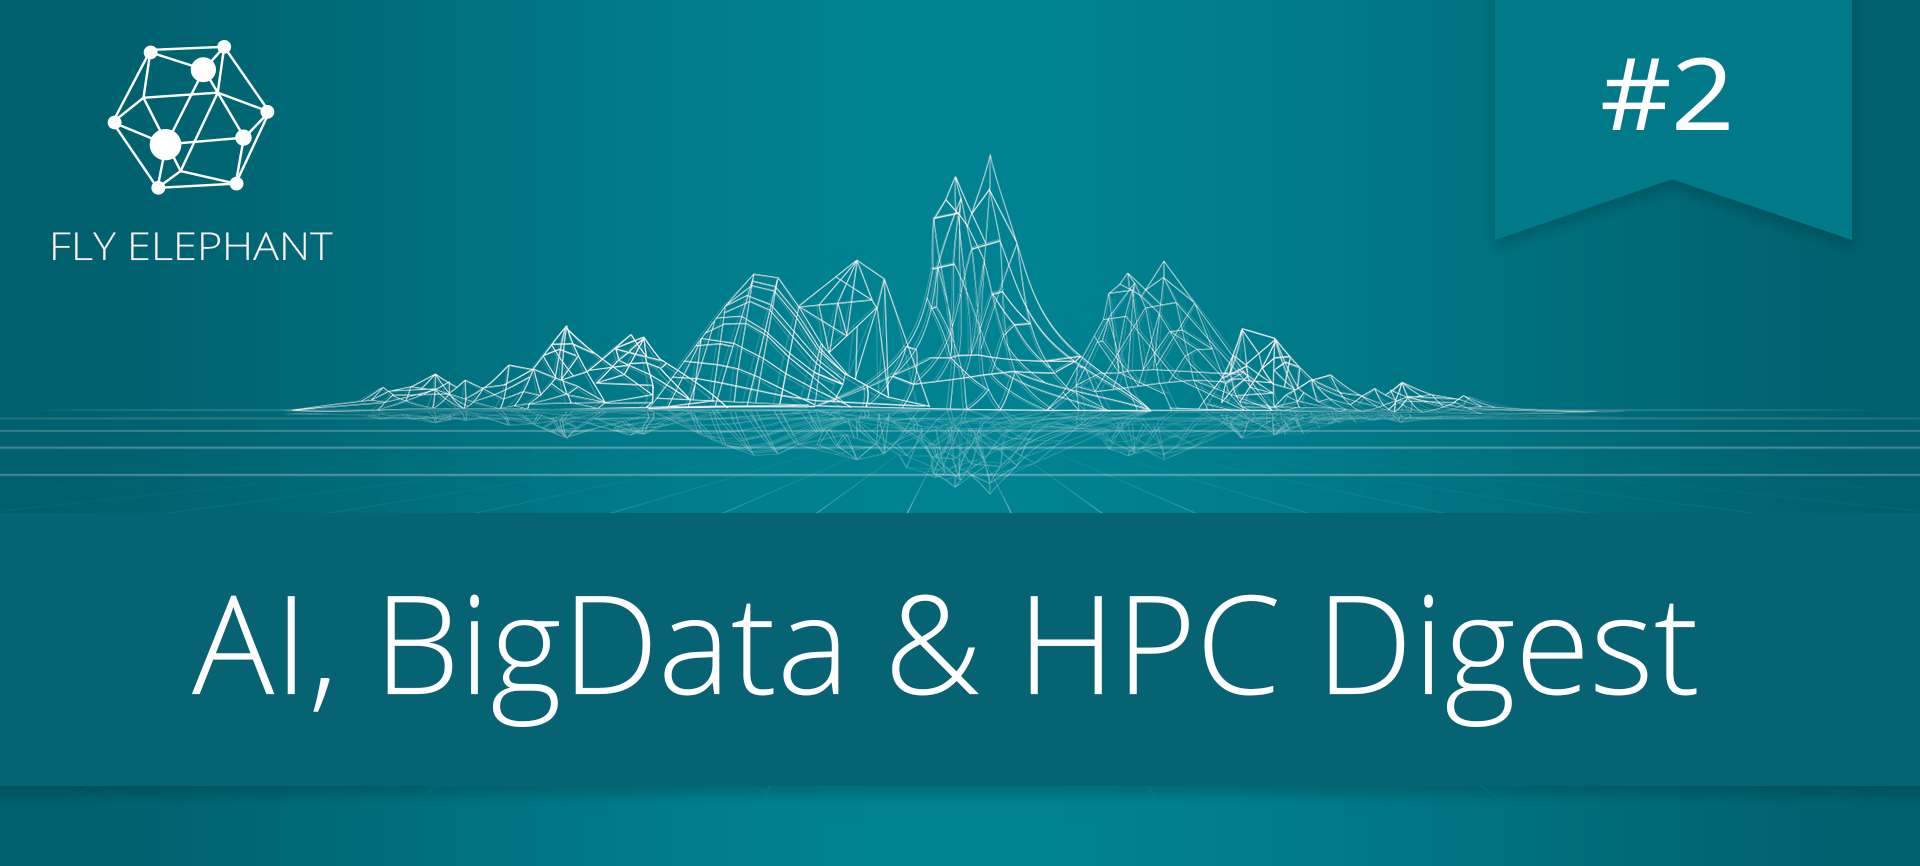 AI, BigData &HPC Digest #2